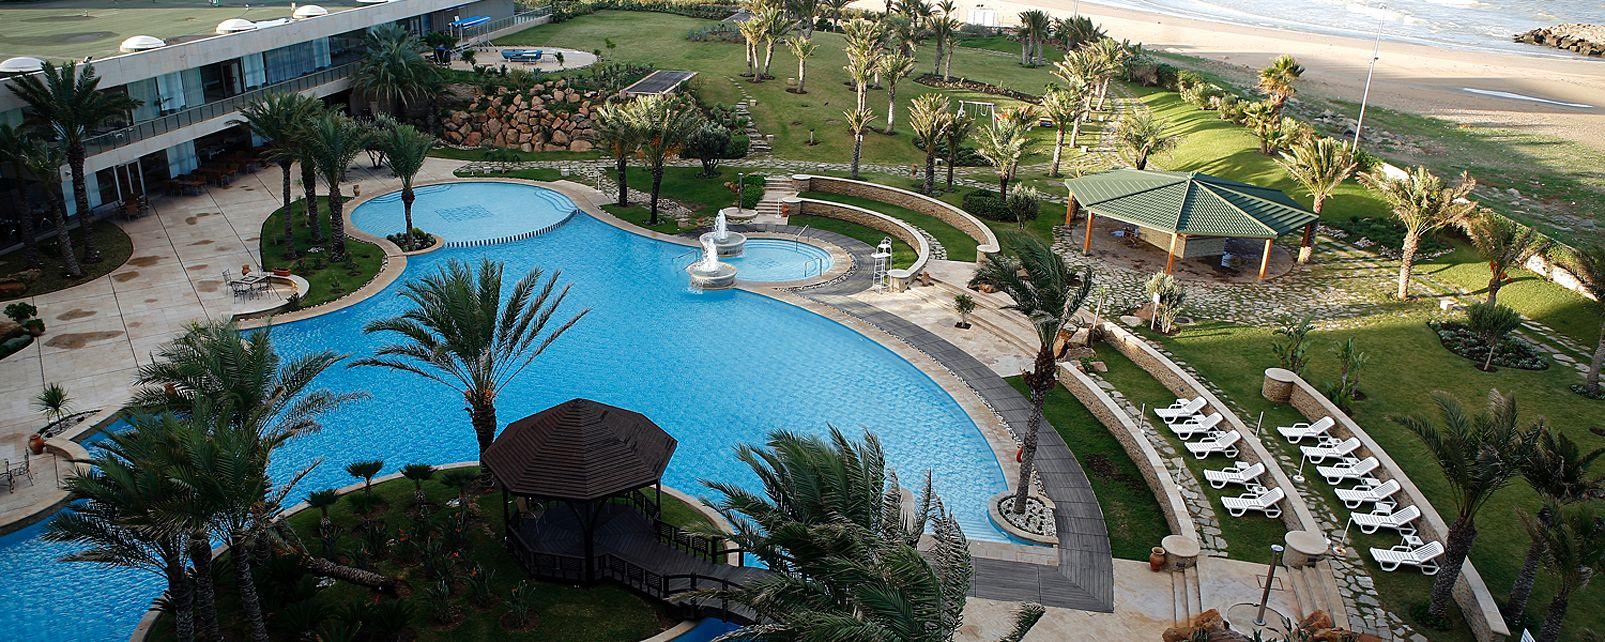 Hôtel Movenpick hotel casinon Malabata